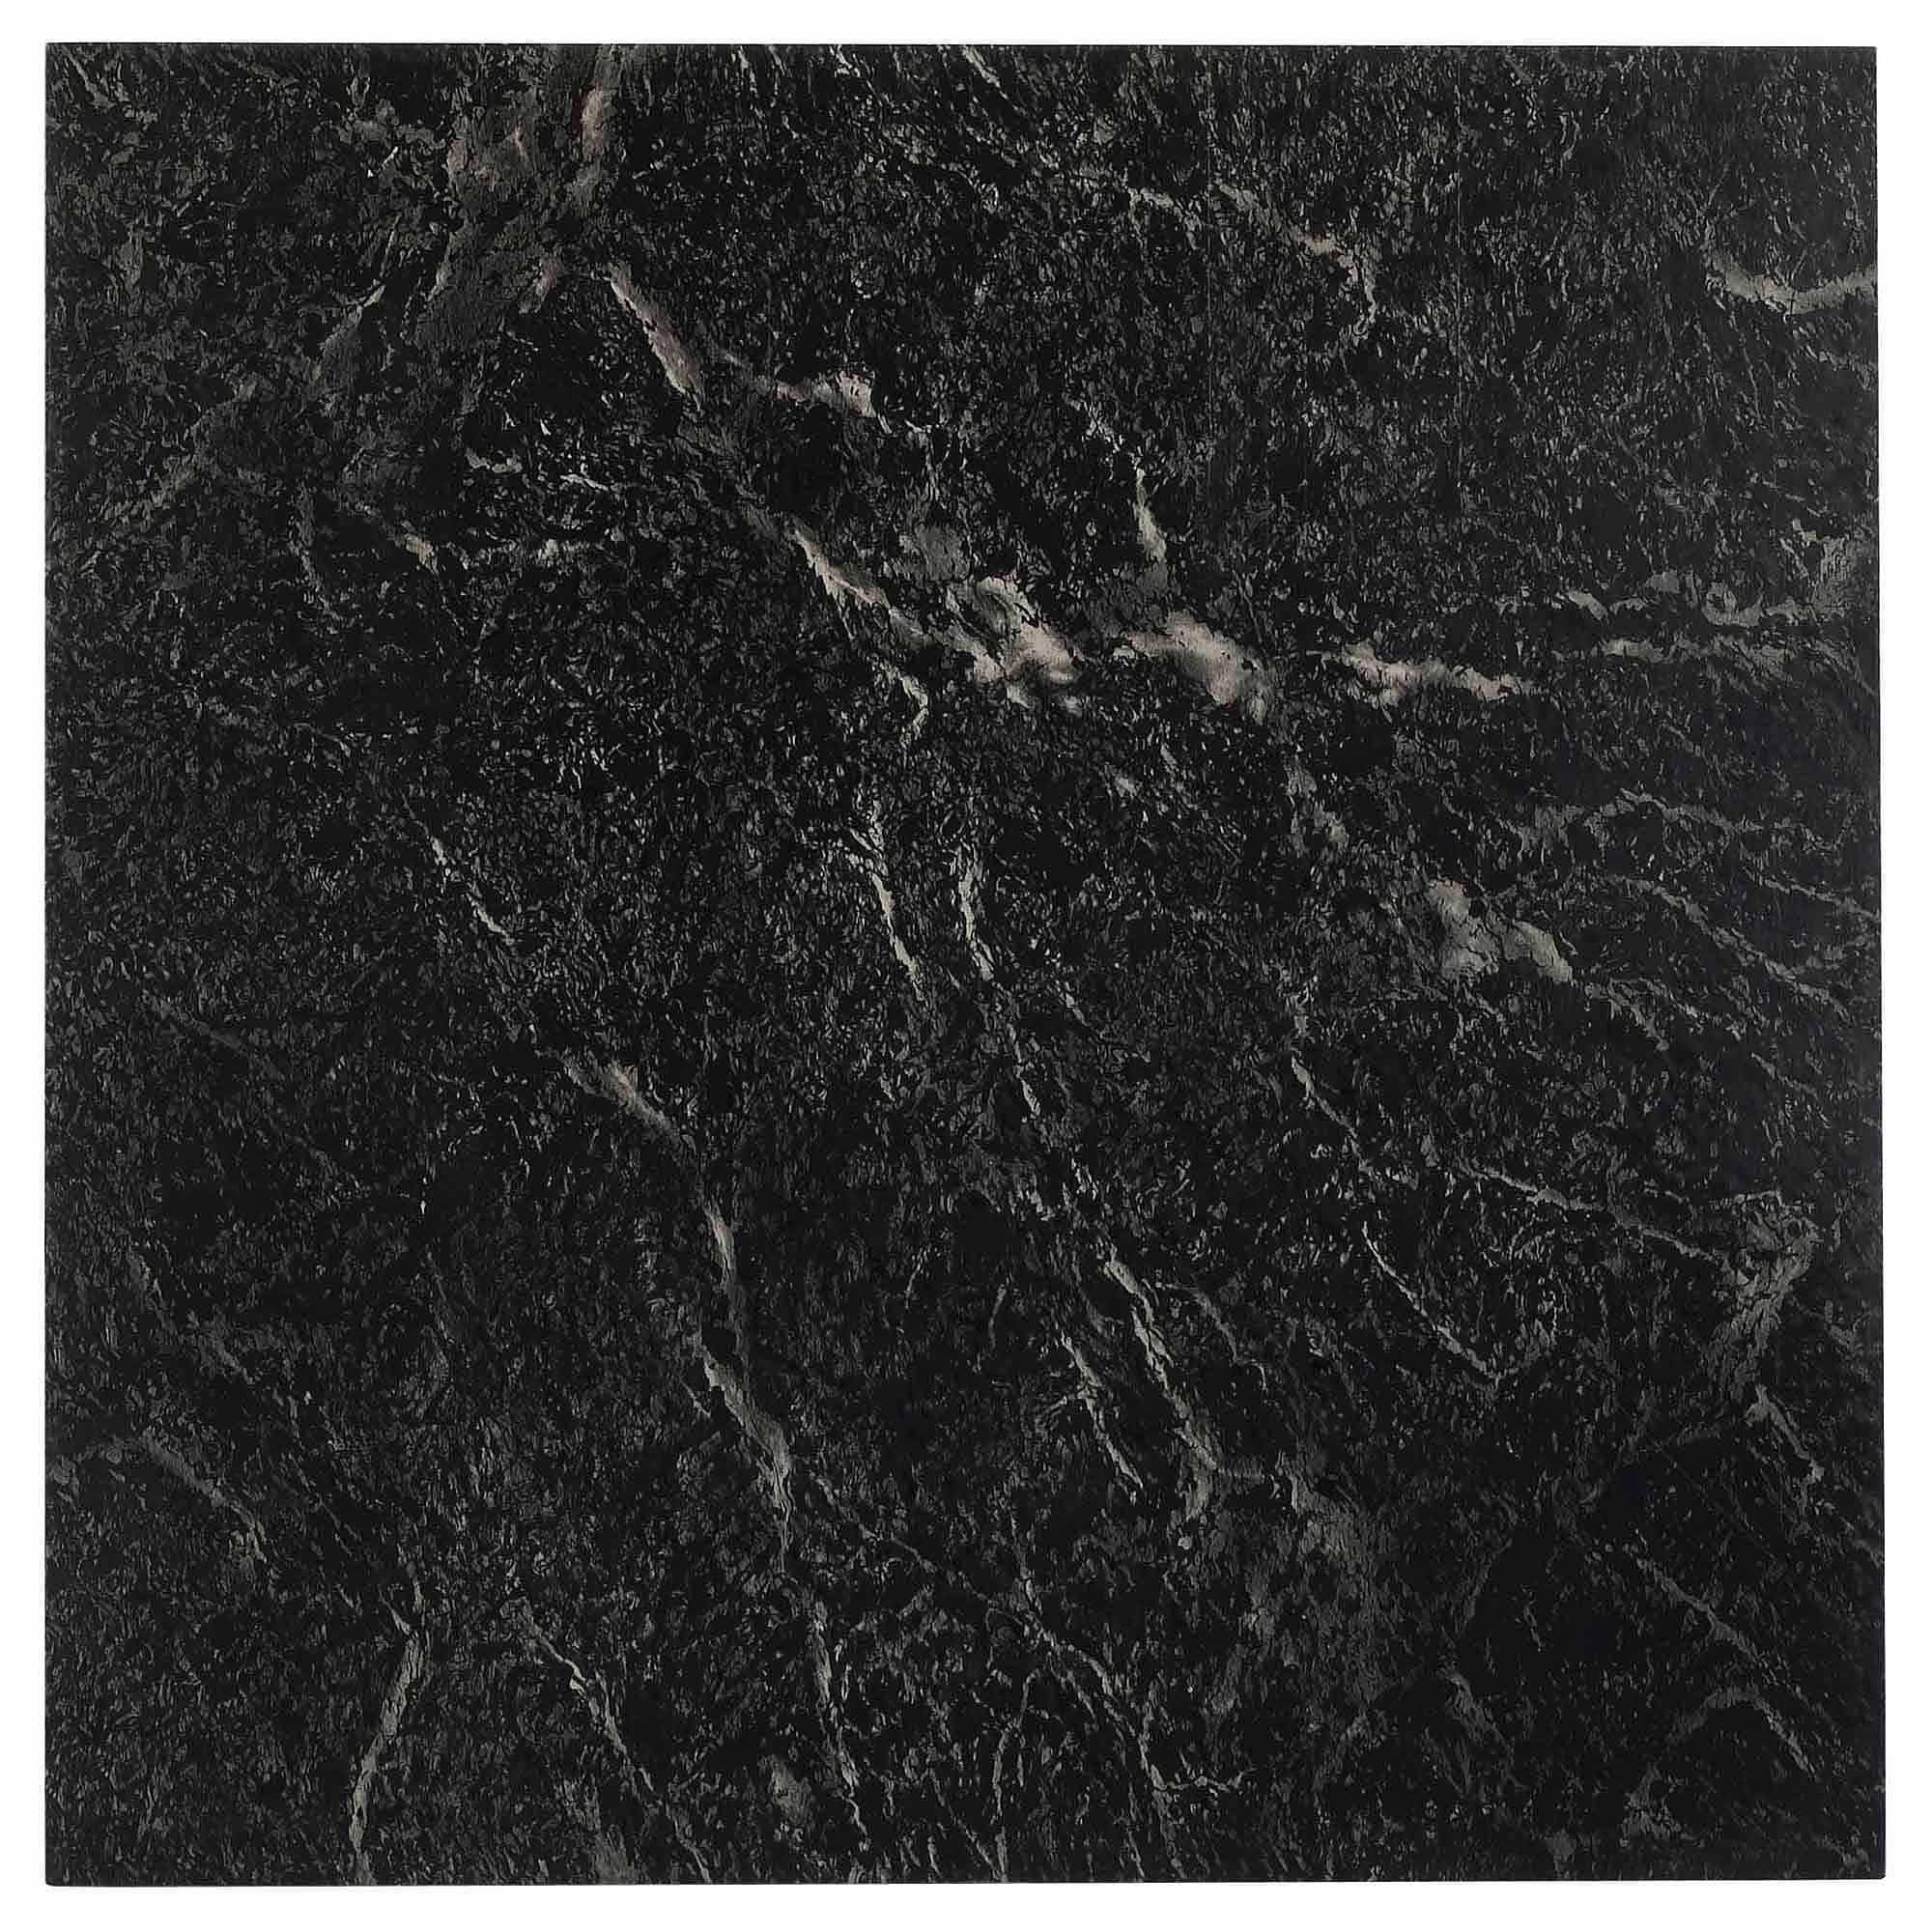 NEXUS Black with White Vein Marble 12x12 Self Adhesive Vinyl Floor Tile - 20 Tiles/20 Sq.Ft.